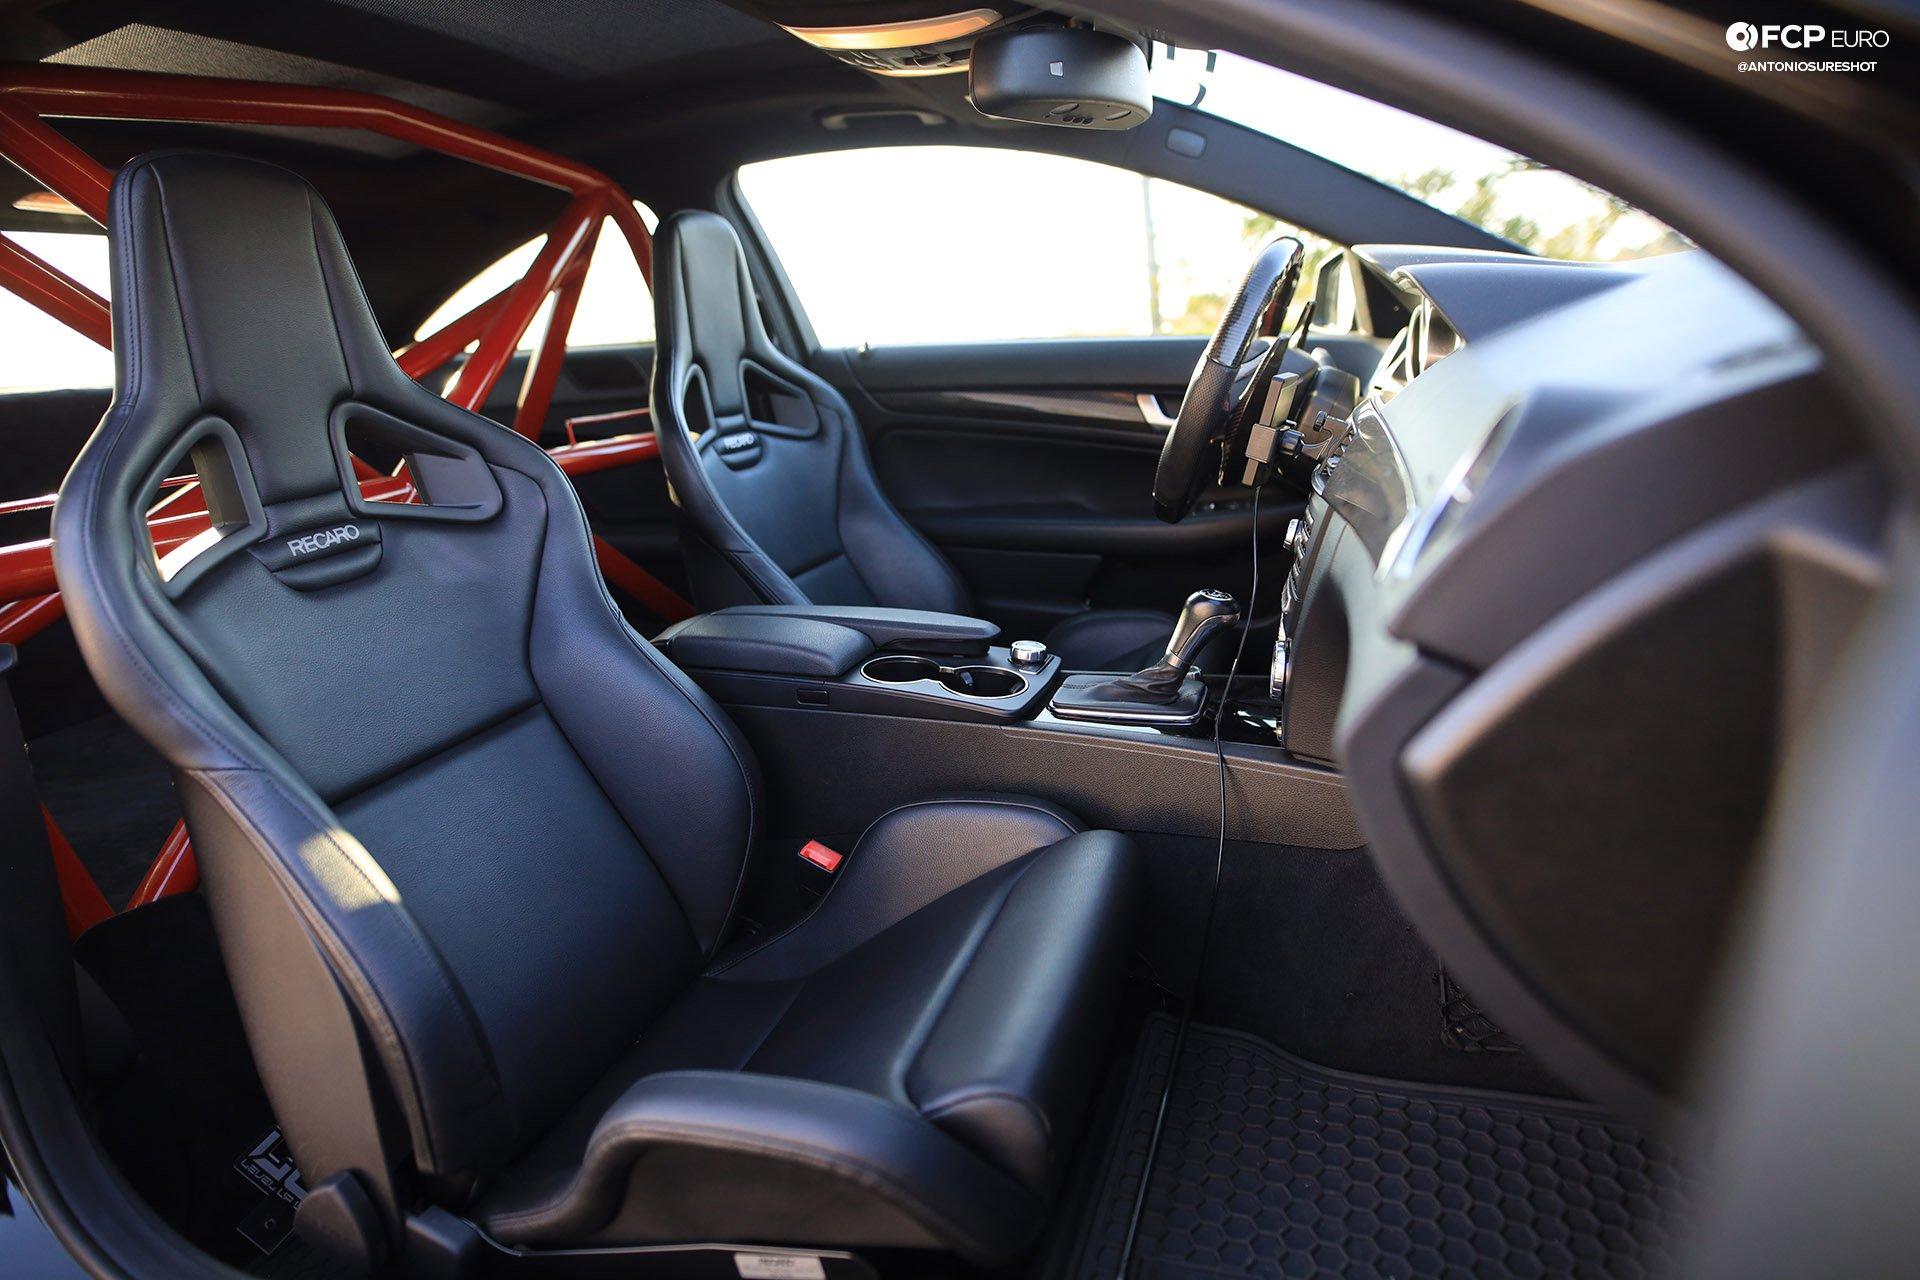 Weistec Supercharged Mercedes-AMG C63 Liberty Walk Recaro Seats